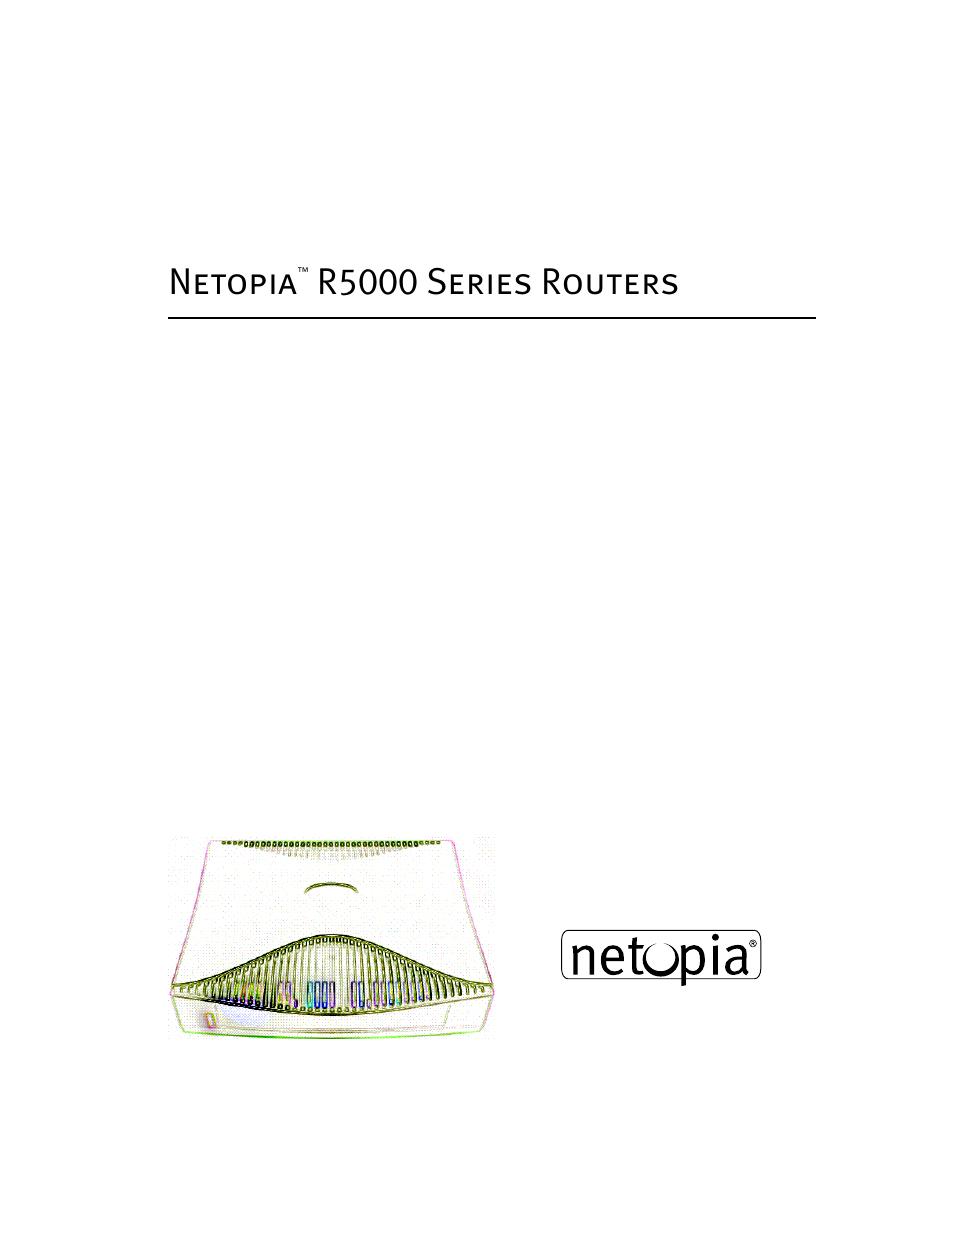 netopia r5300 user manual 290 pages also for r5200 r5000 r5100 rh manualsdir com Netopia DefaultPassword Netopia 3000